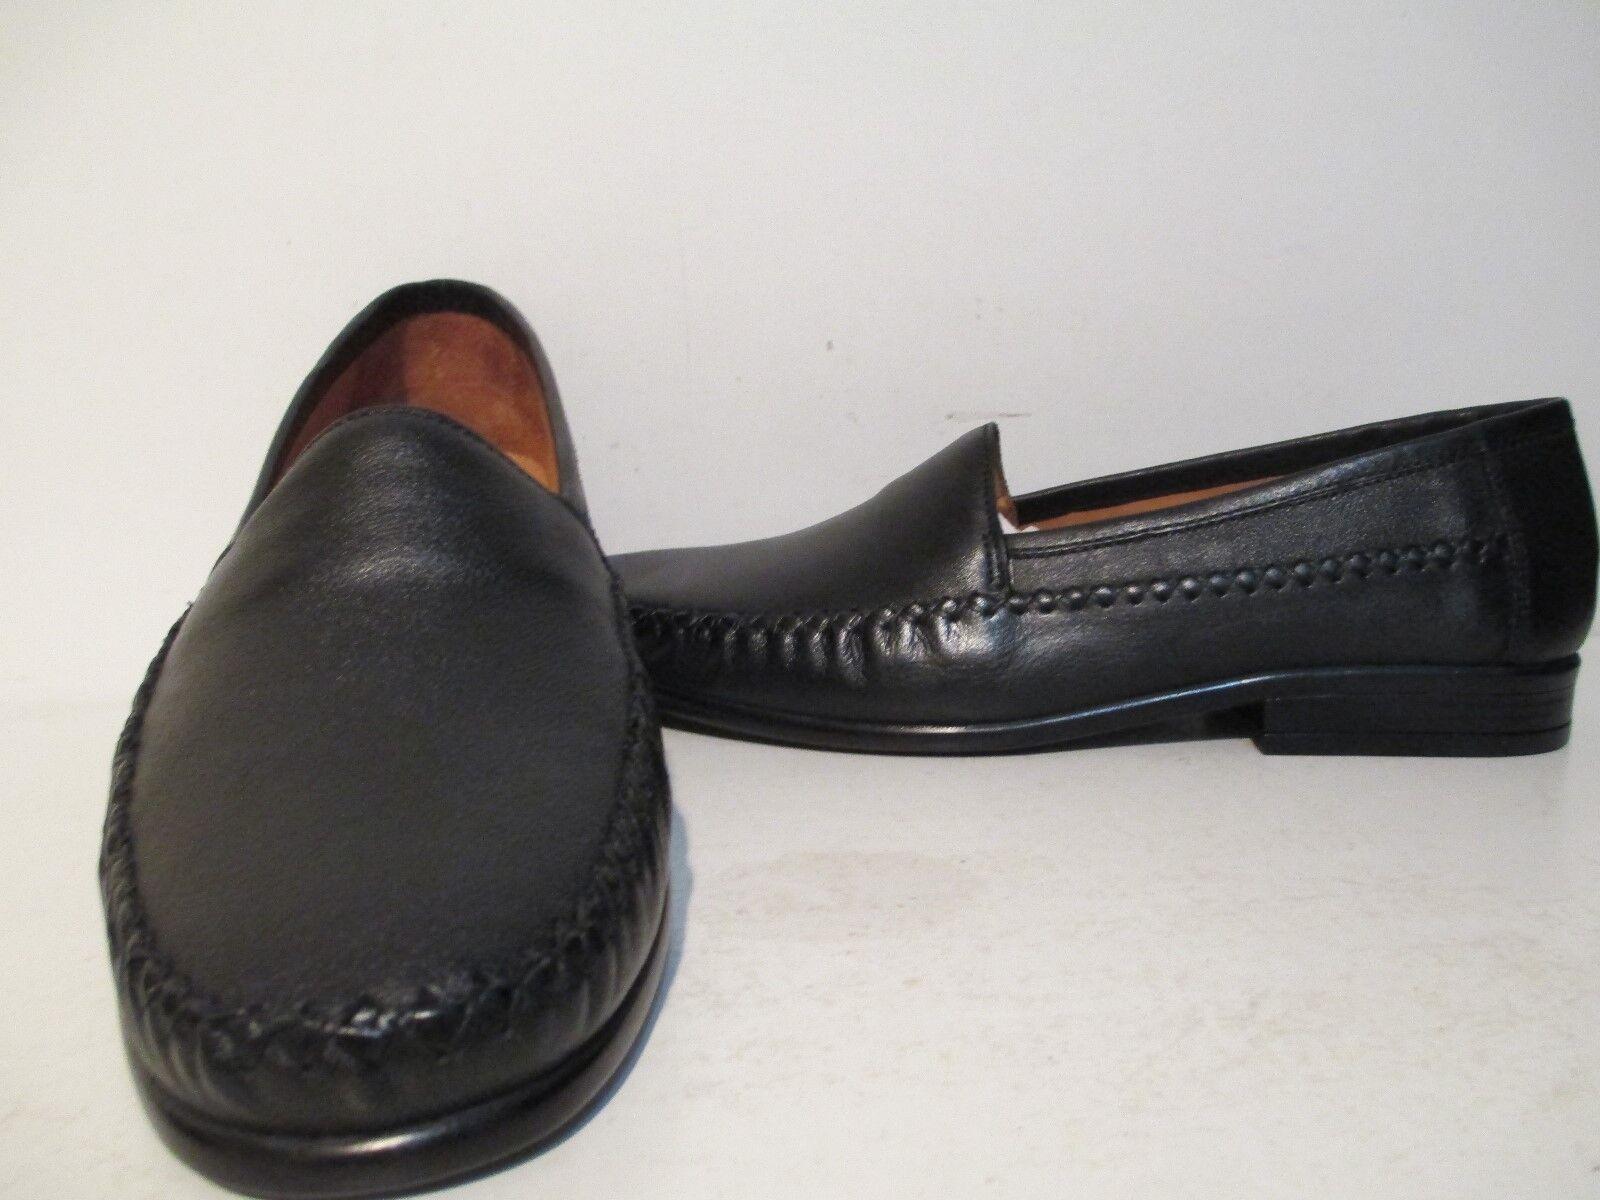 Giorgio Brutini Mens Mortoni 67134 Leather Slip On Casual Loafers Black Size 13